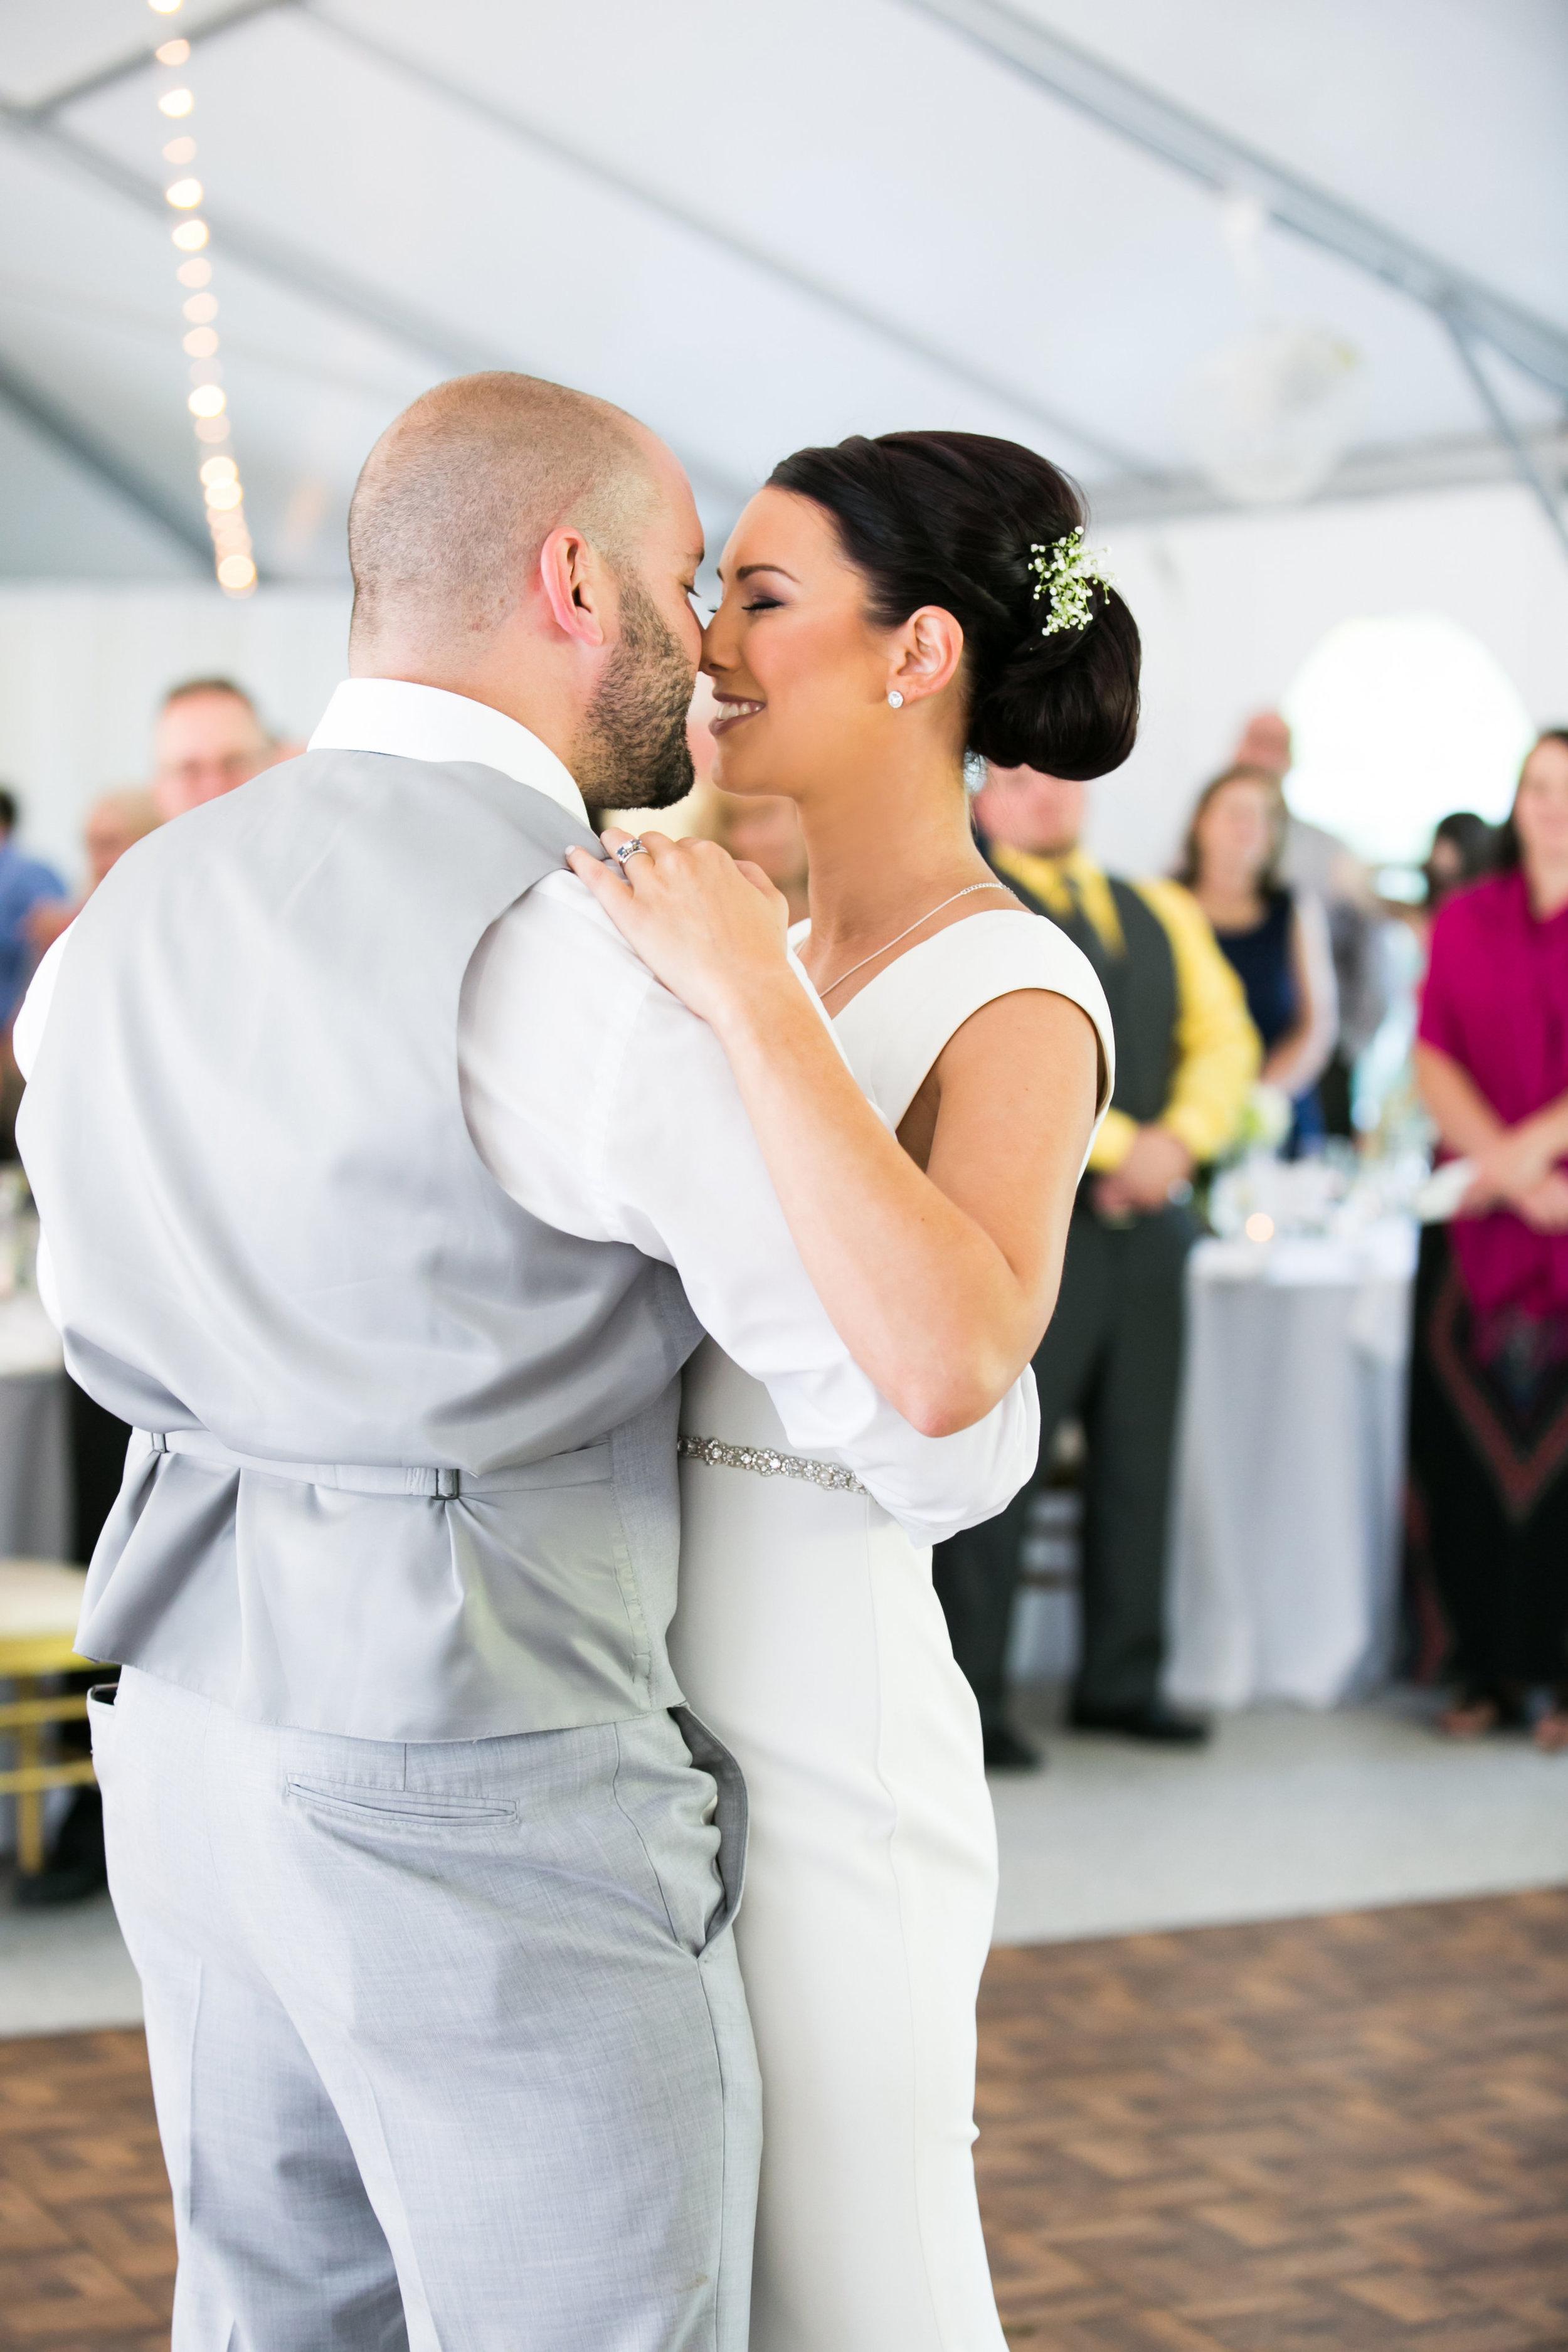 Pure elegance events Tynise Kee dc wedding planner va wedding planner rust manor house leesburg -0056.jpg